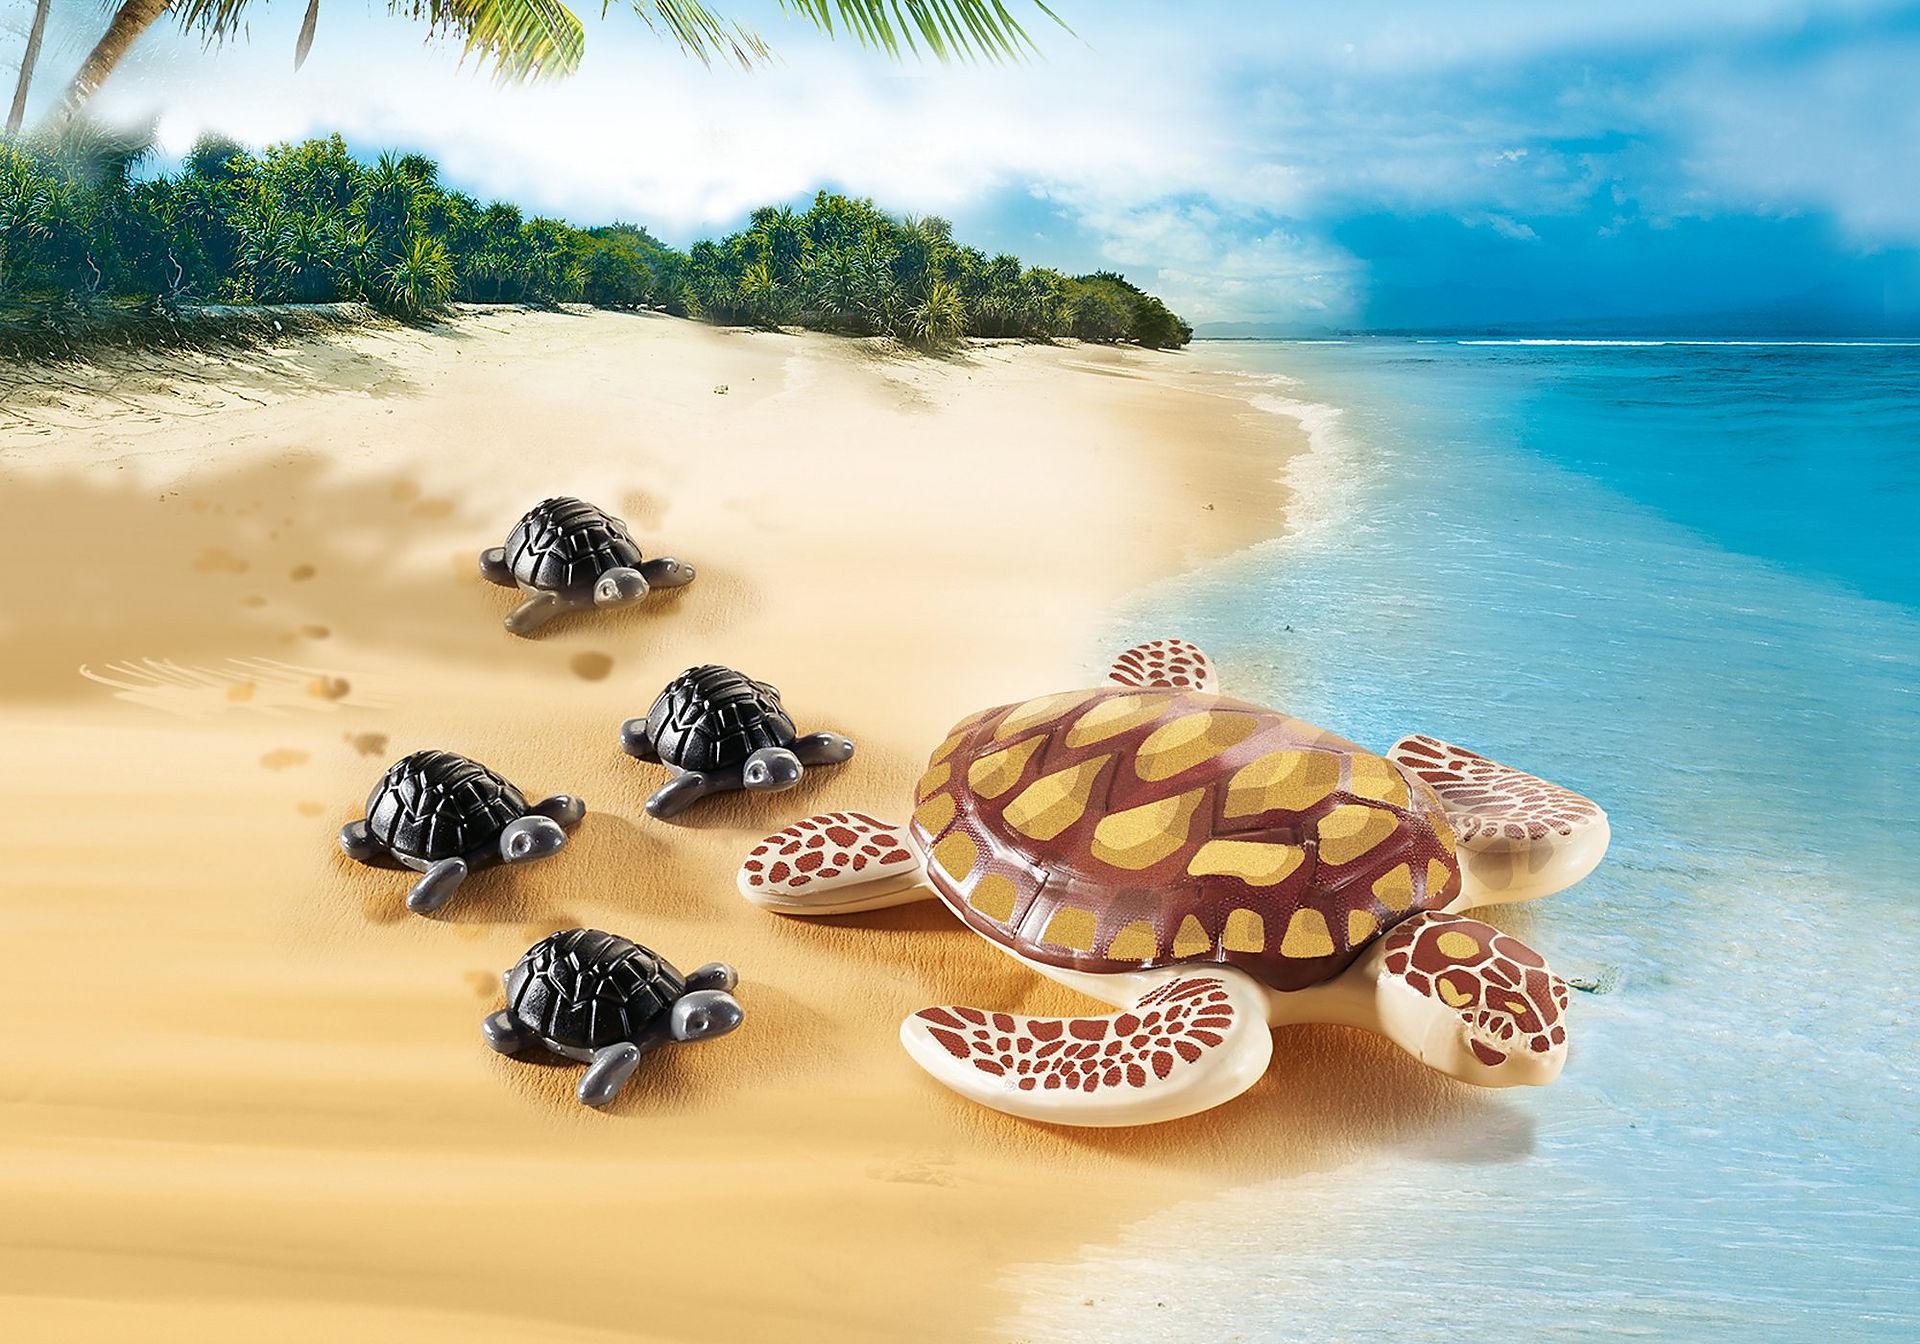 9071 Sea Turtle with Babies zoom image1